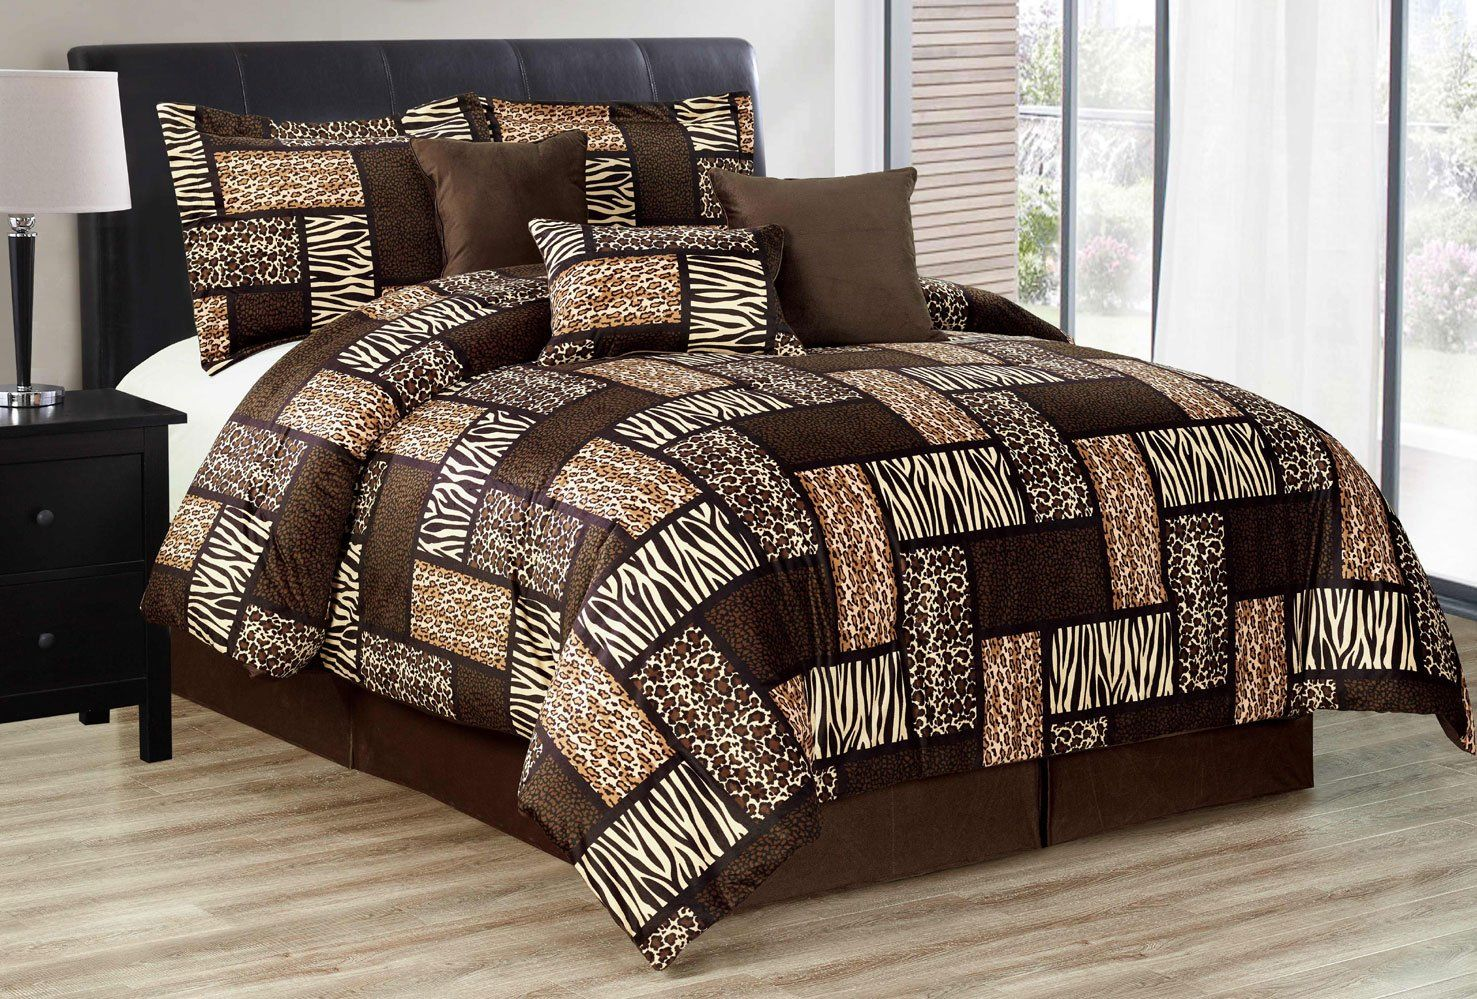 7 Piece California Cal King Size Safari Comforter Set Leopard